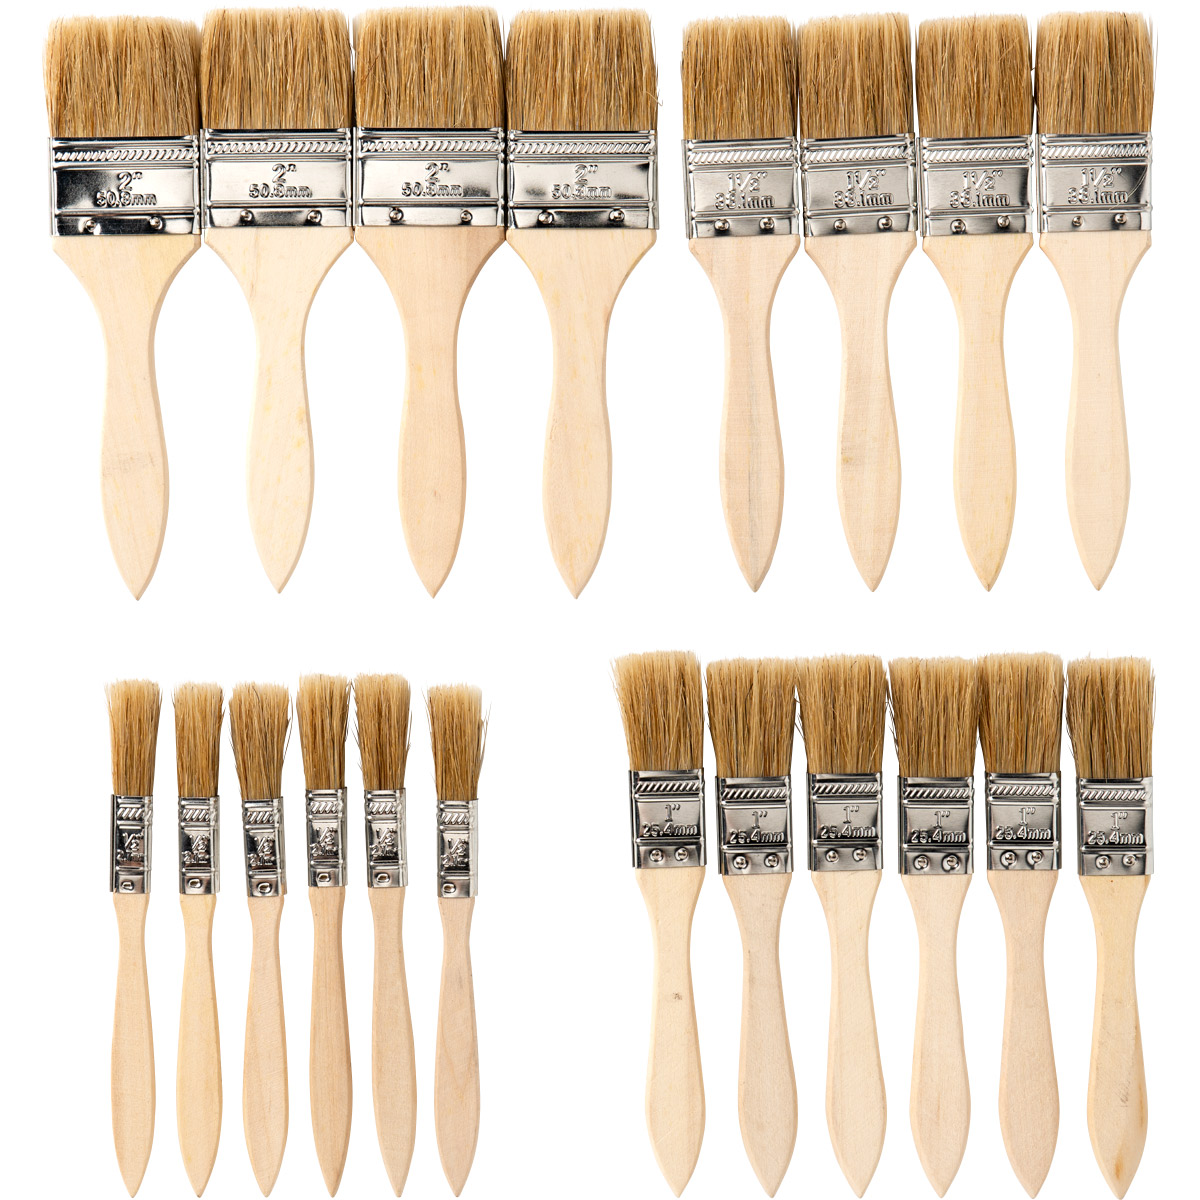 Apple Barrel ® Brush Sets - Chip Brush Value Set, 20 pc.